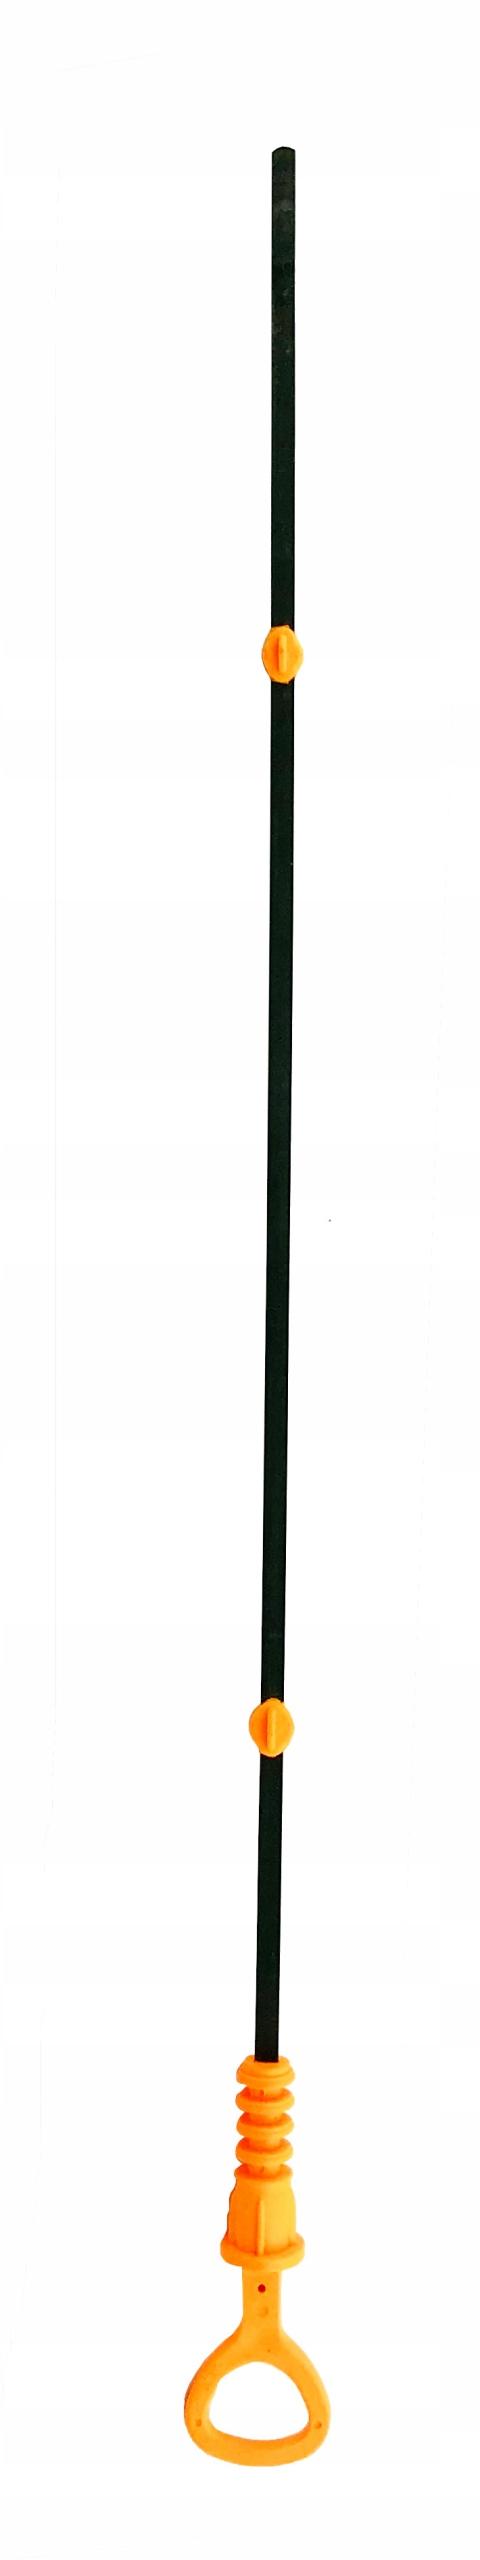 штык совок масла vw гольф v vi + 16 06a115611c